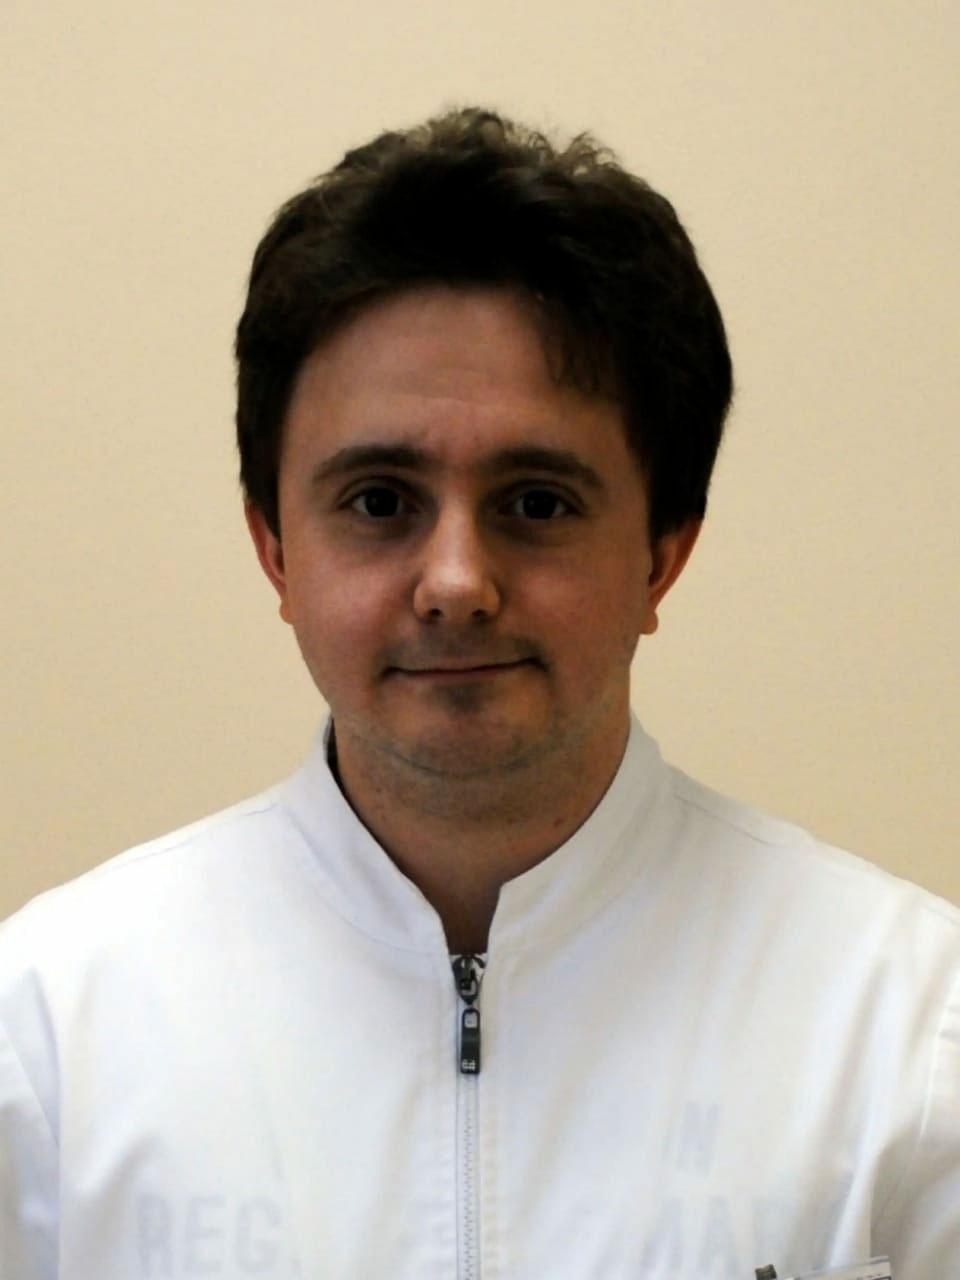 Романов Федор Суренович  – врач стоматолог-терапевт, стоматолог-терапевт детский